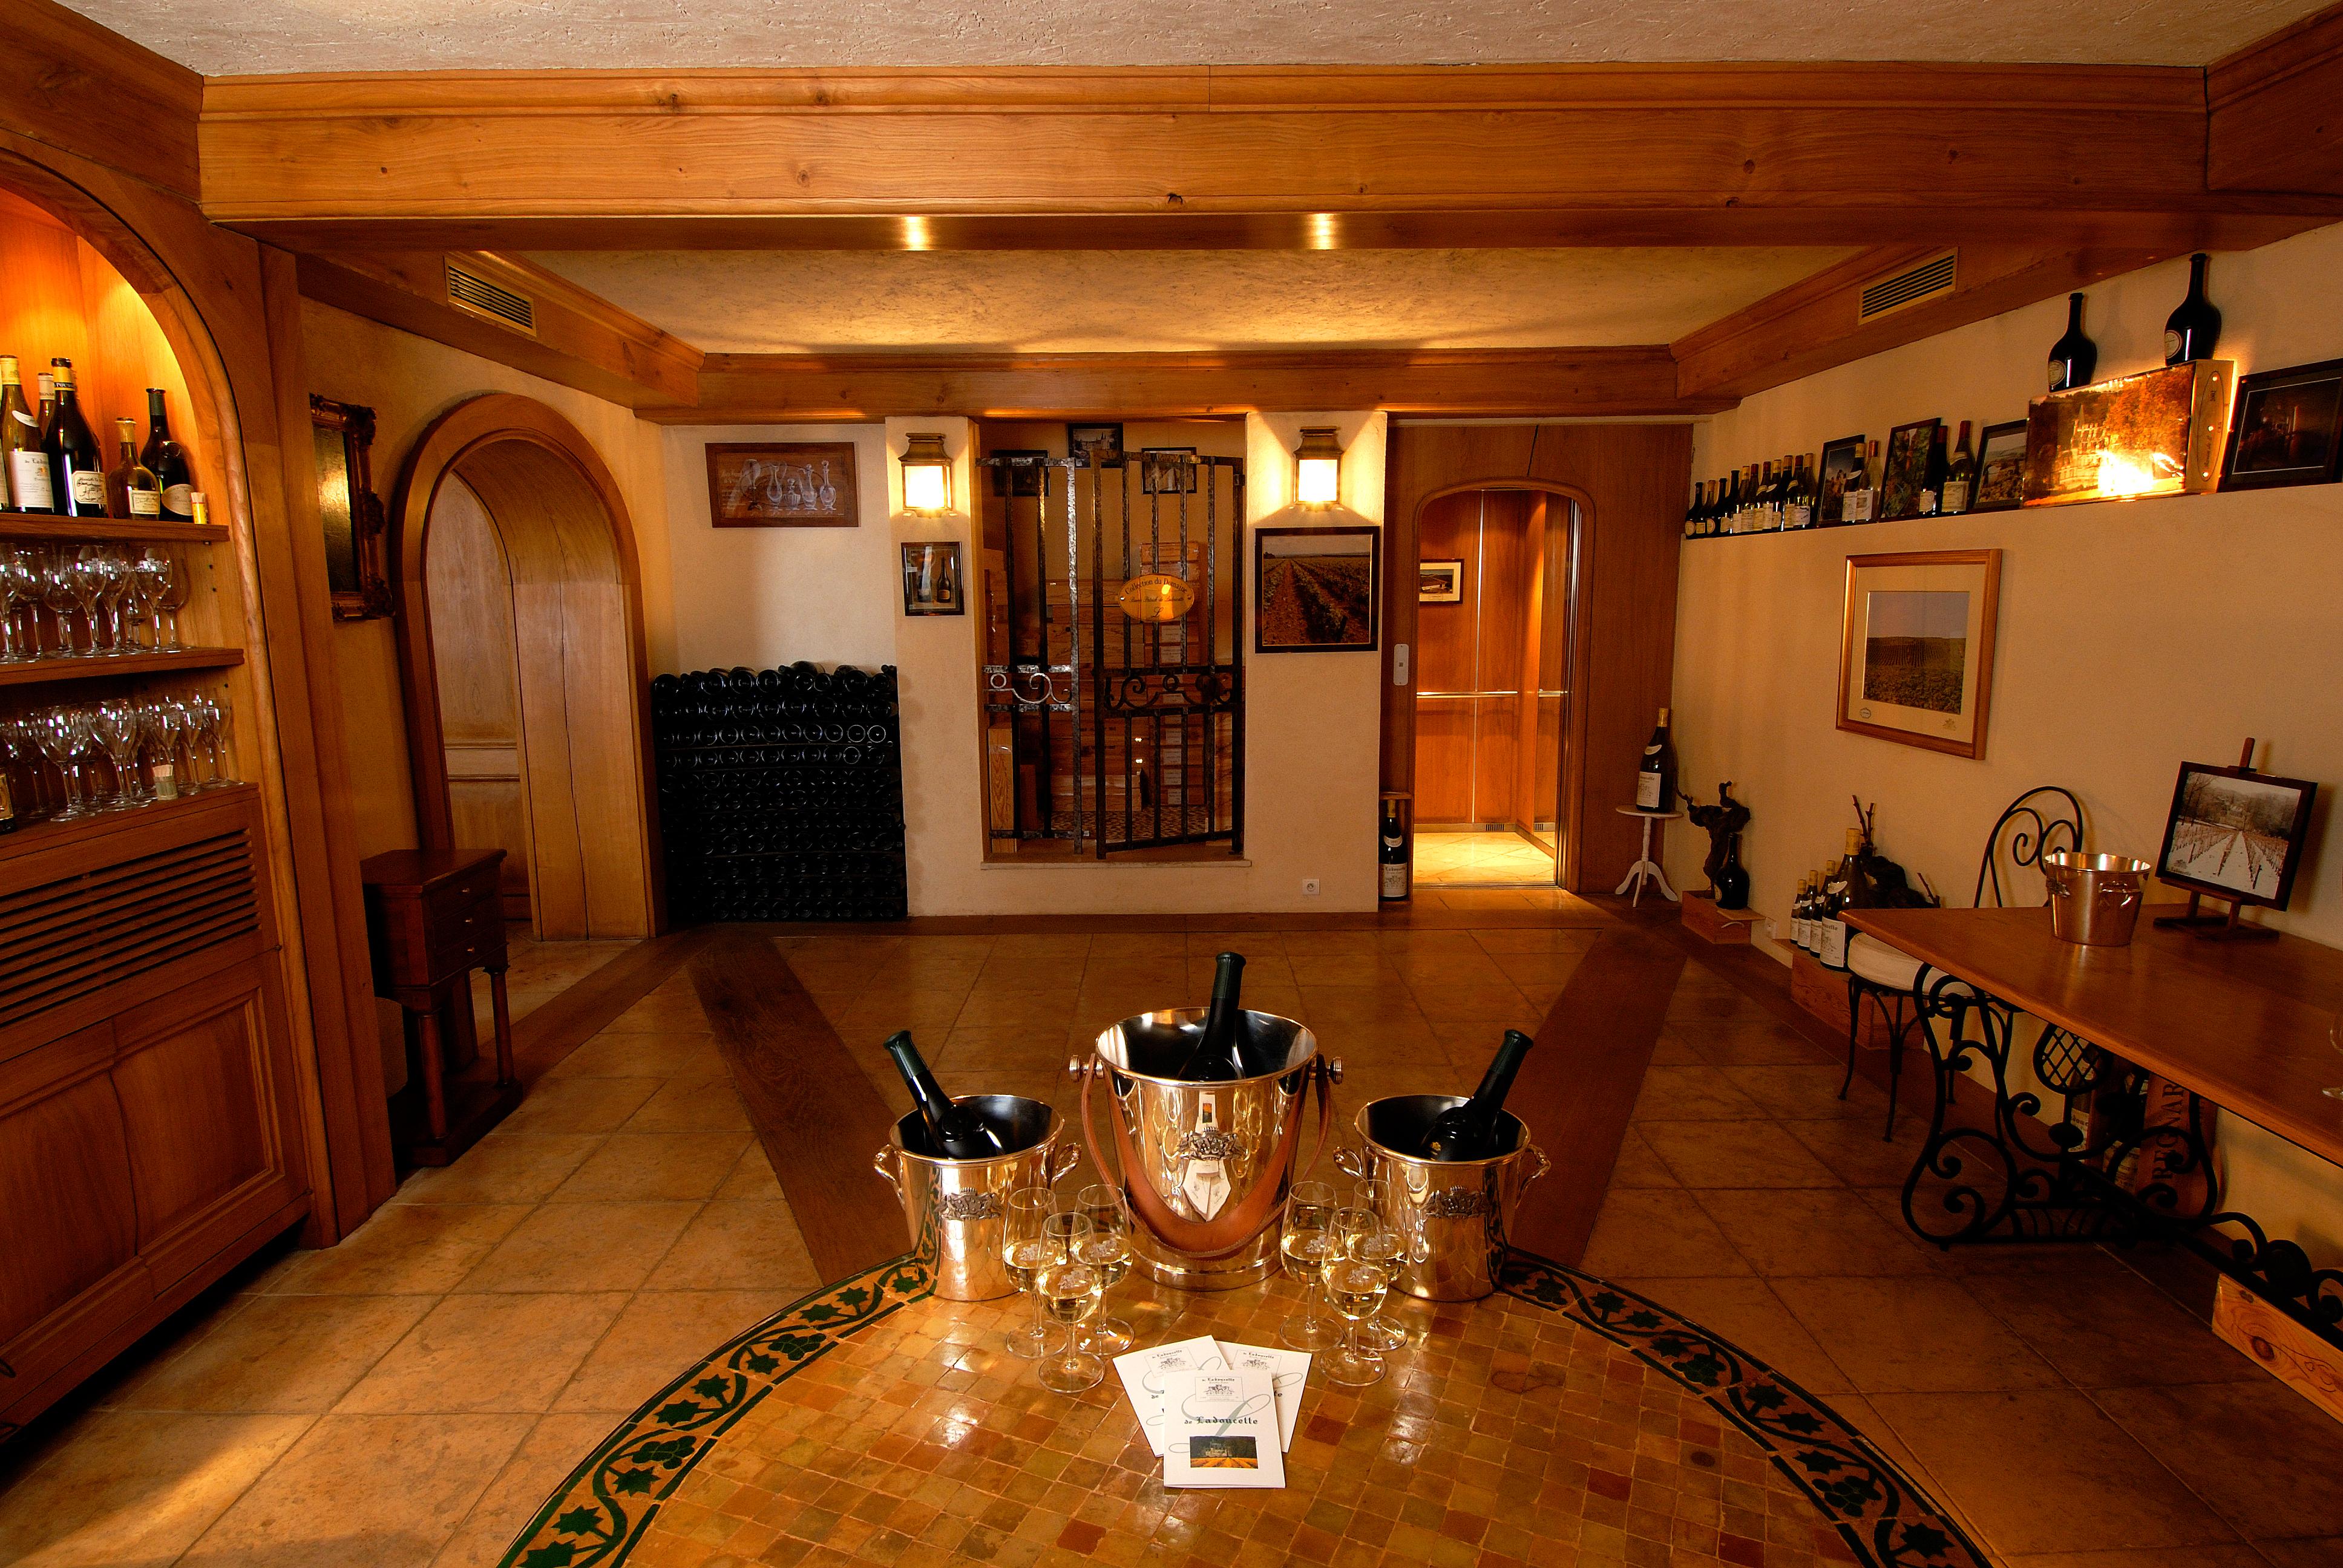 Wine Cellars of Ladoucette Paris (1)